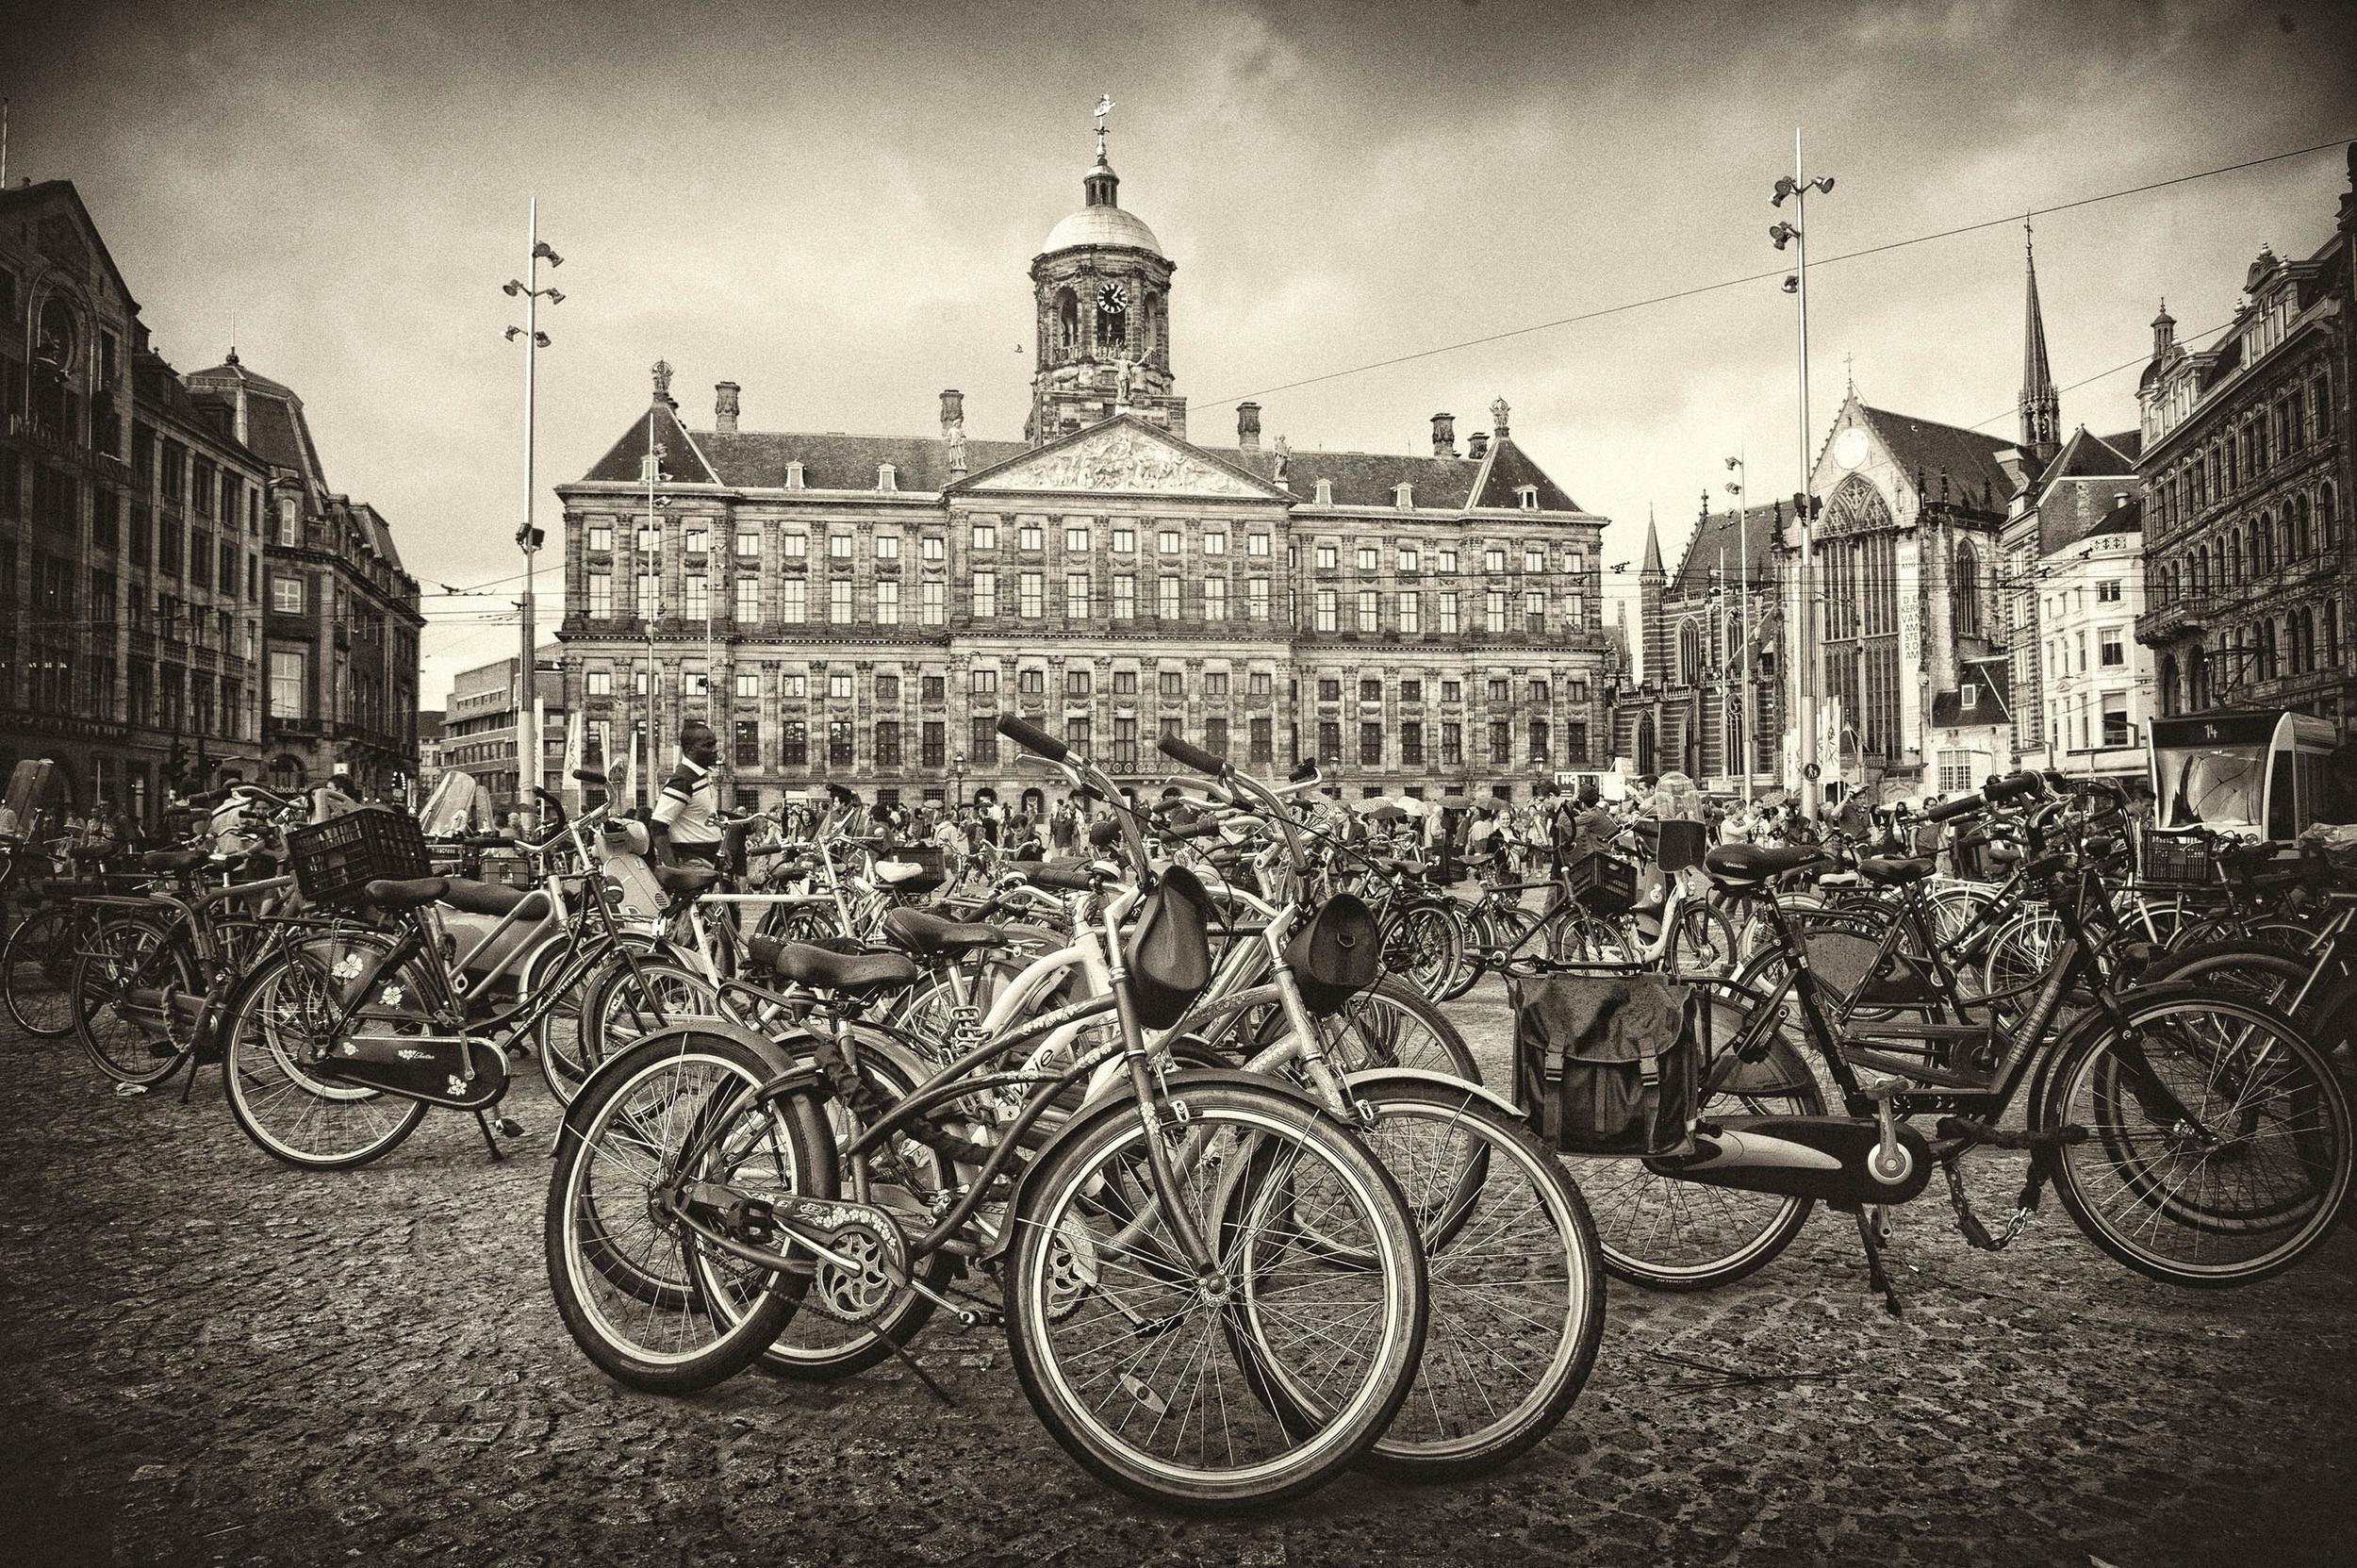 dam square amsterdam.jpg